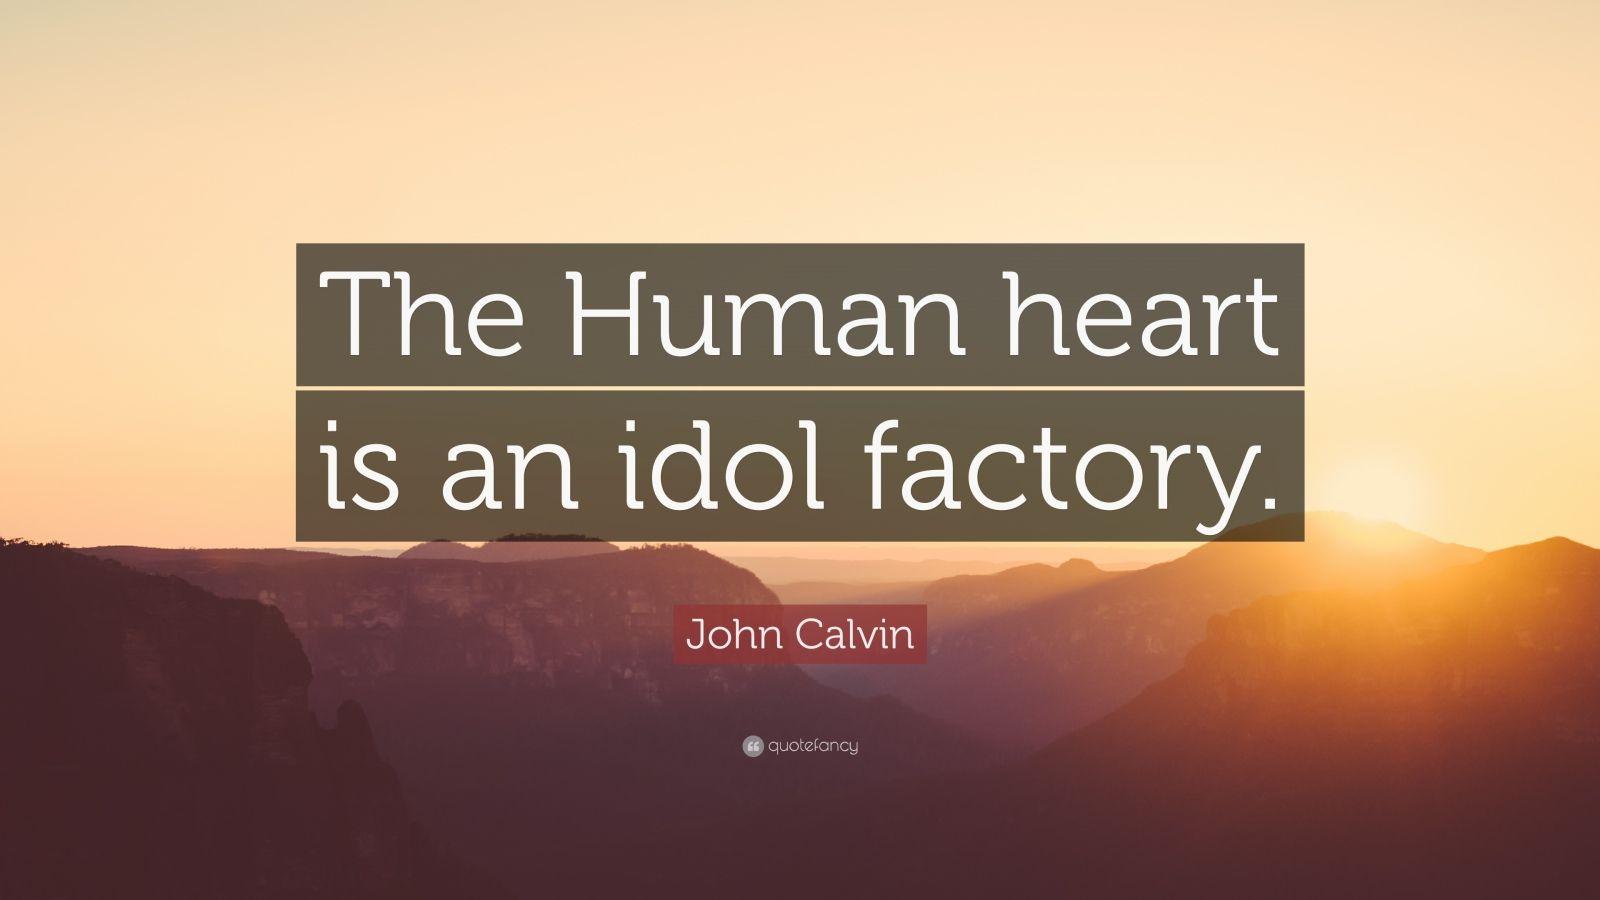 Steve Jobs Motivational Quotes Wallpaper John Calvin Quote The Human Heart Is An Idol Factory